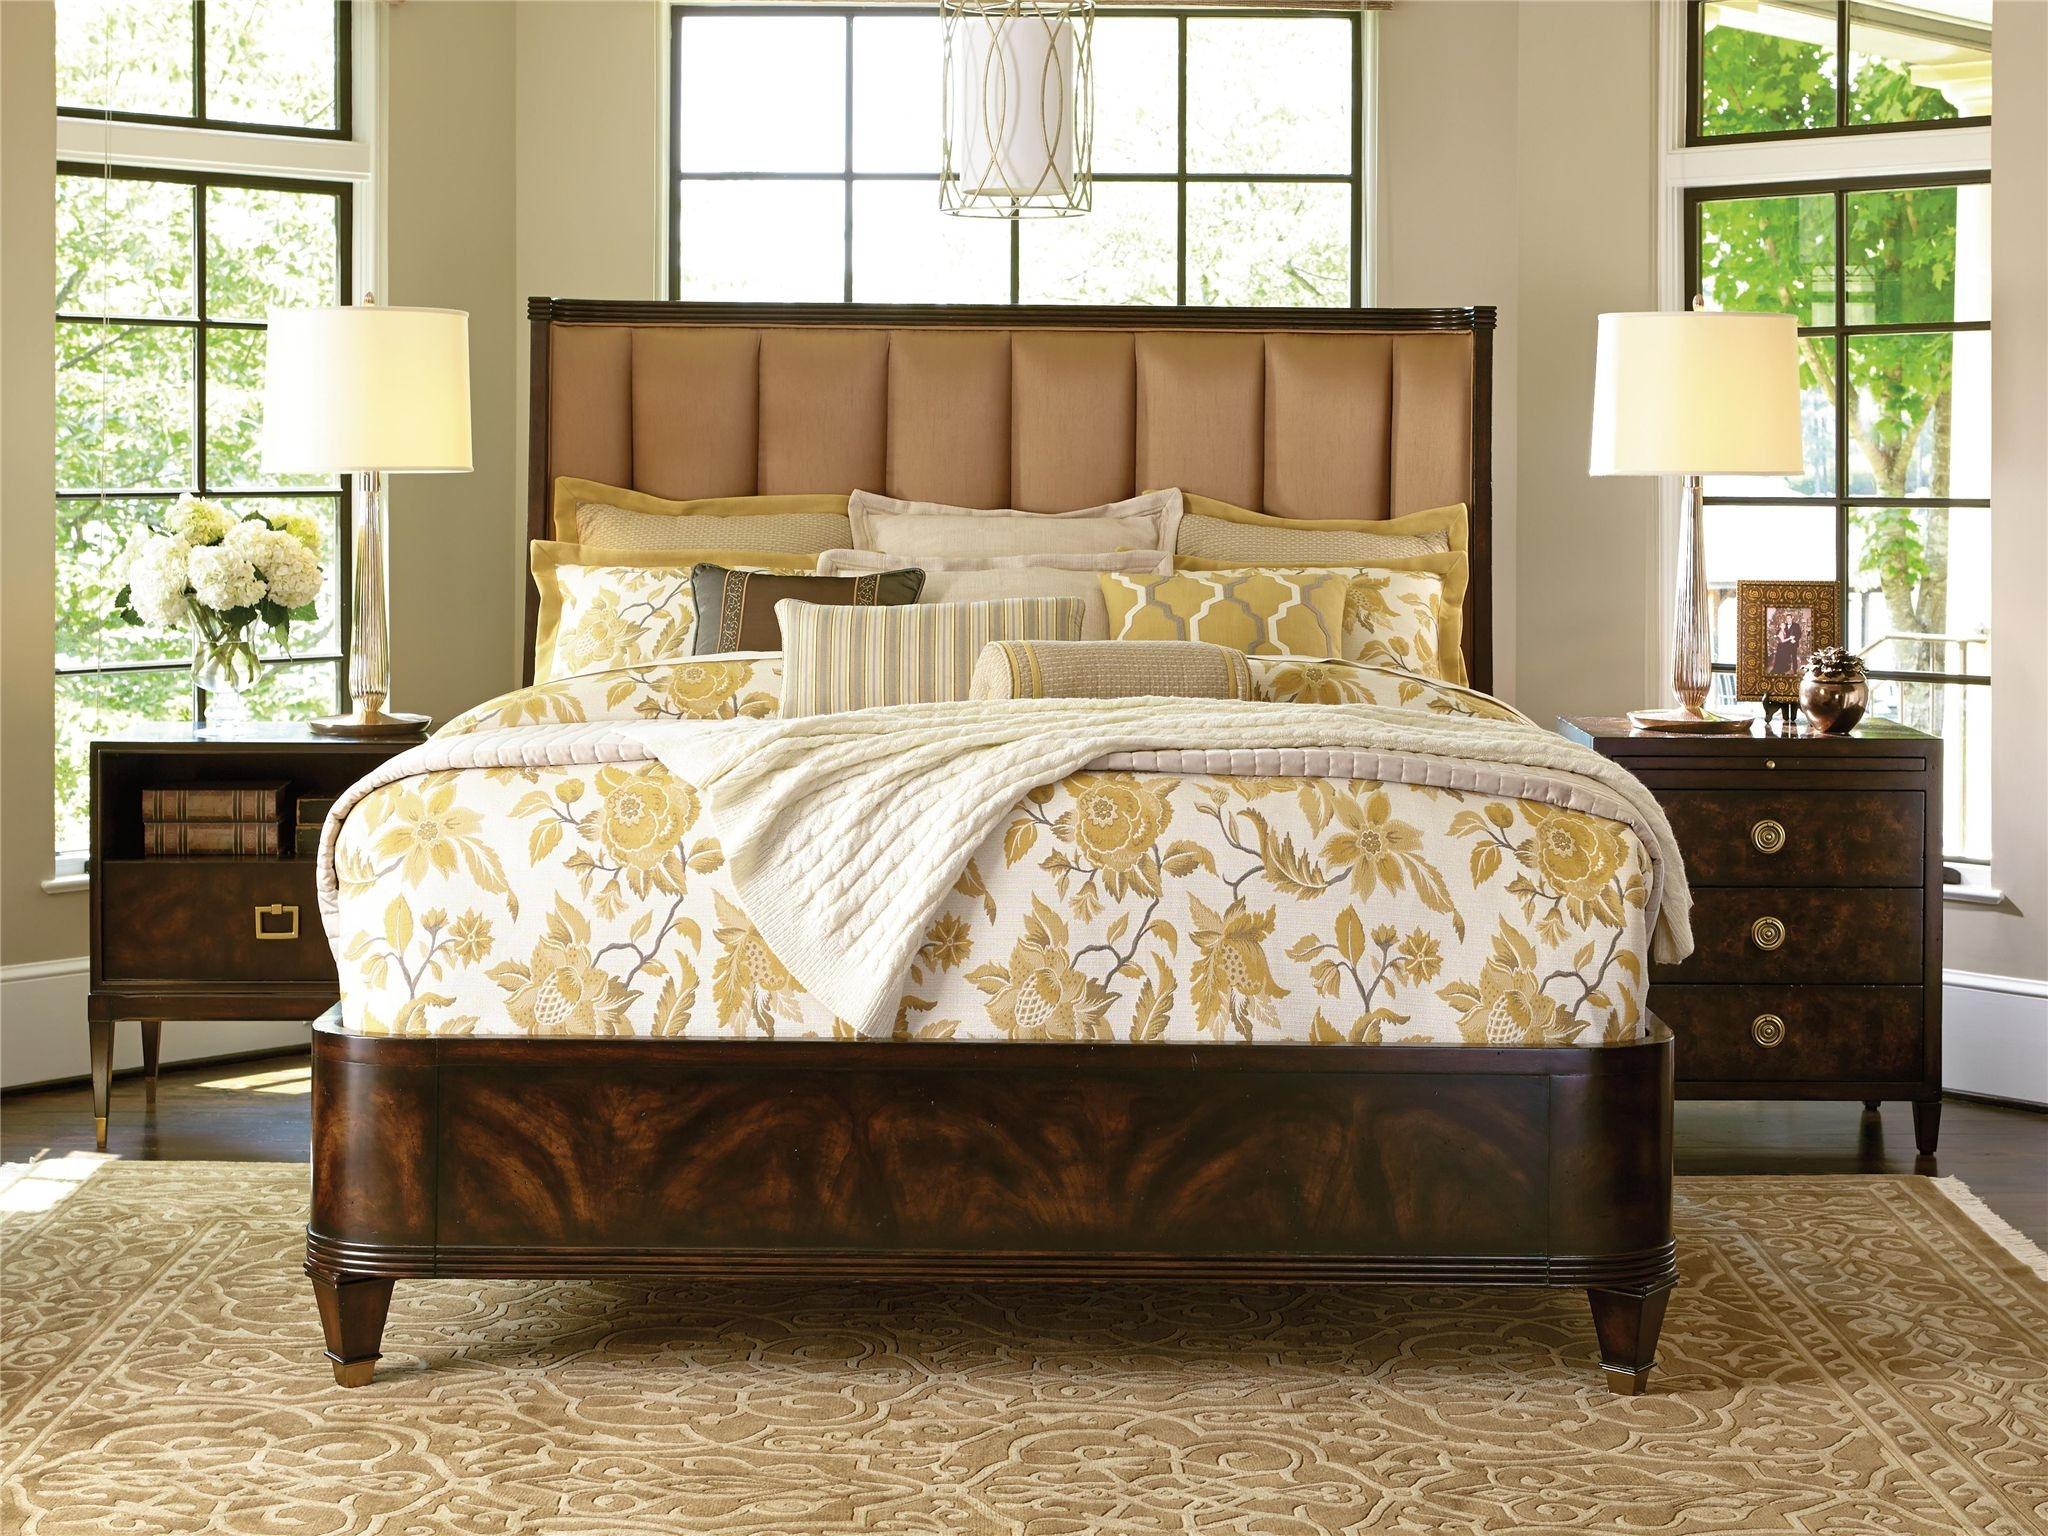 exciting georgian bedroom furniture pics inspirations